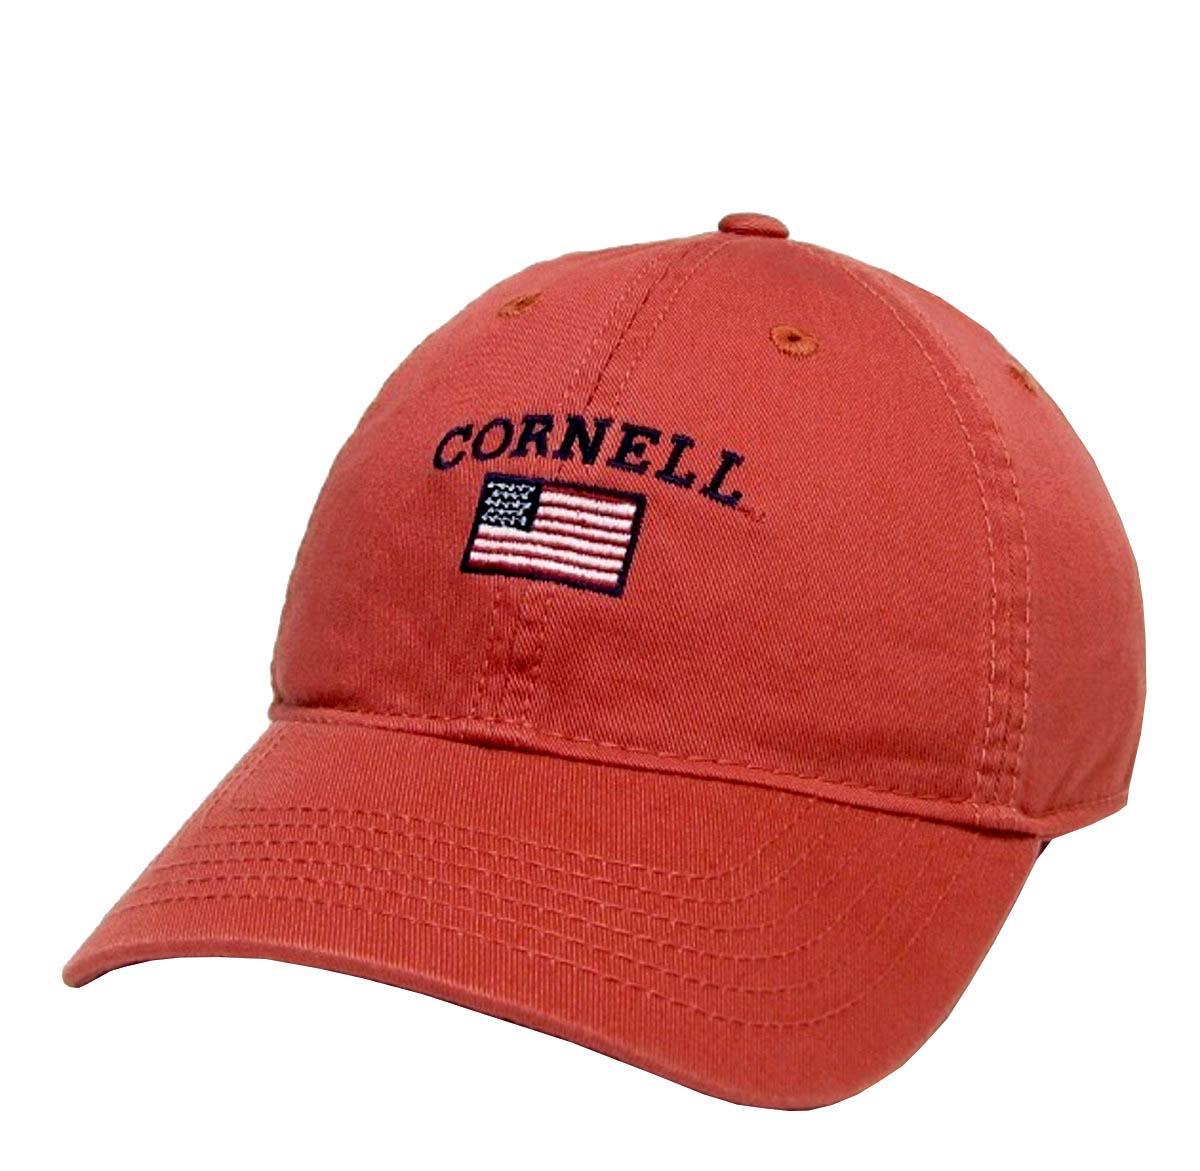 e585d8608d2 Classic cornell cap with flag jpg 1200x1171 Cornell hat